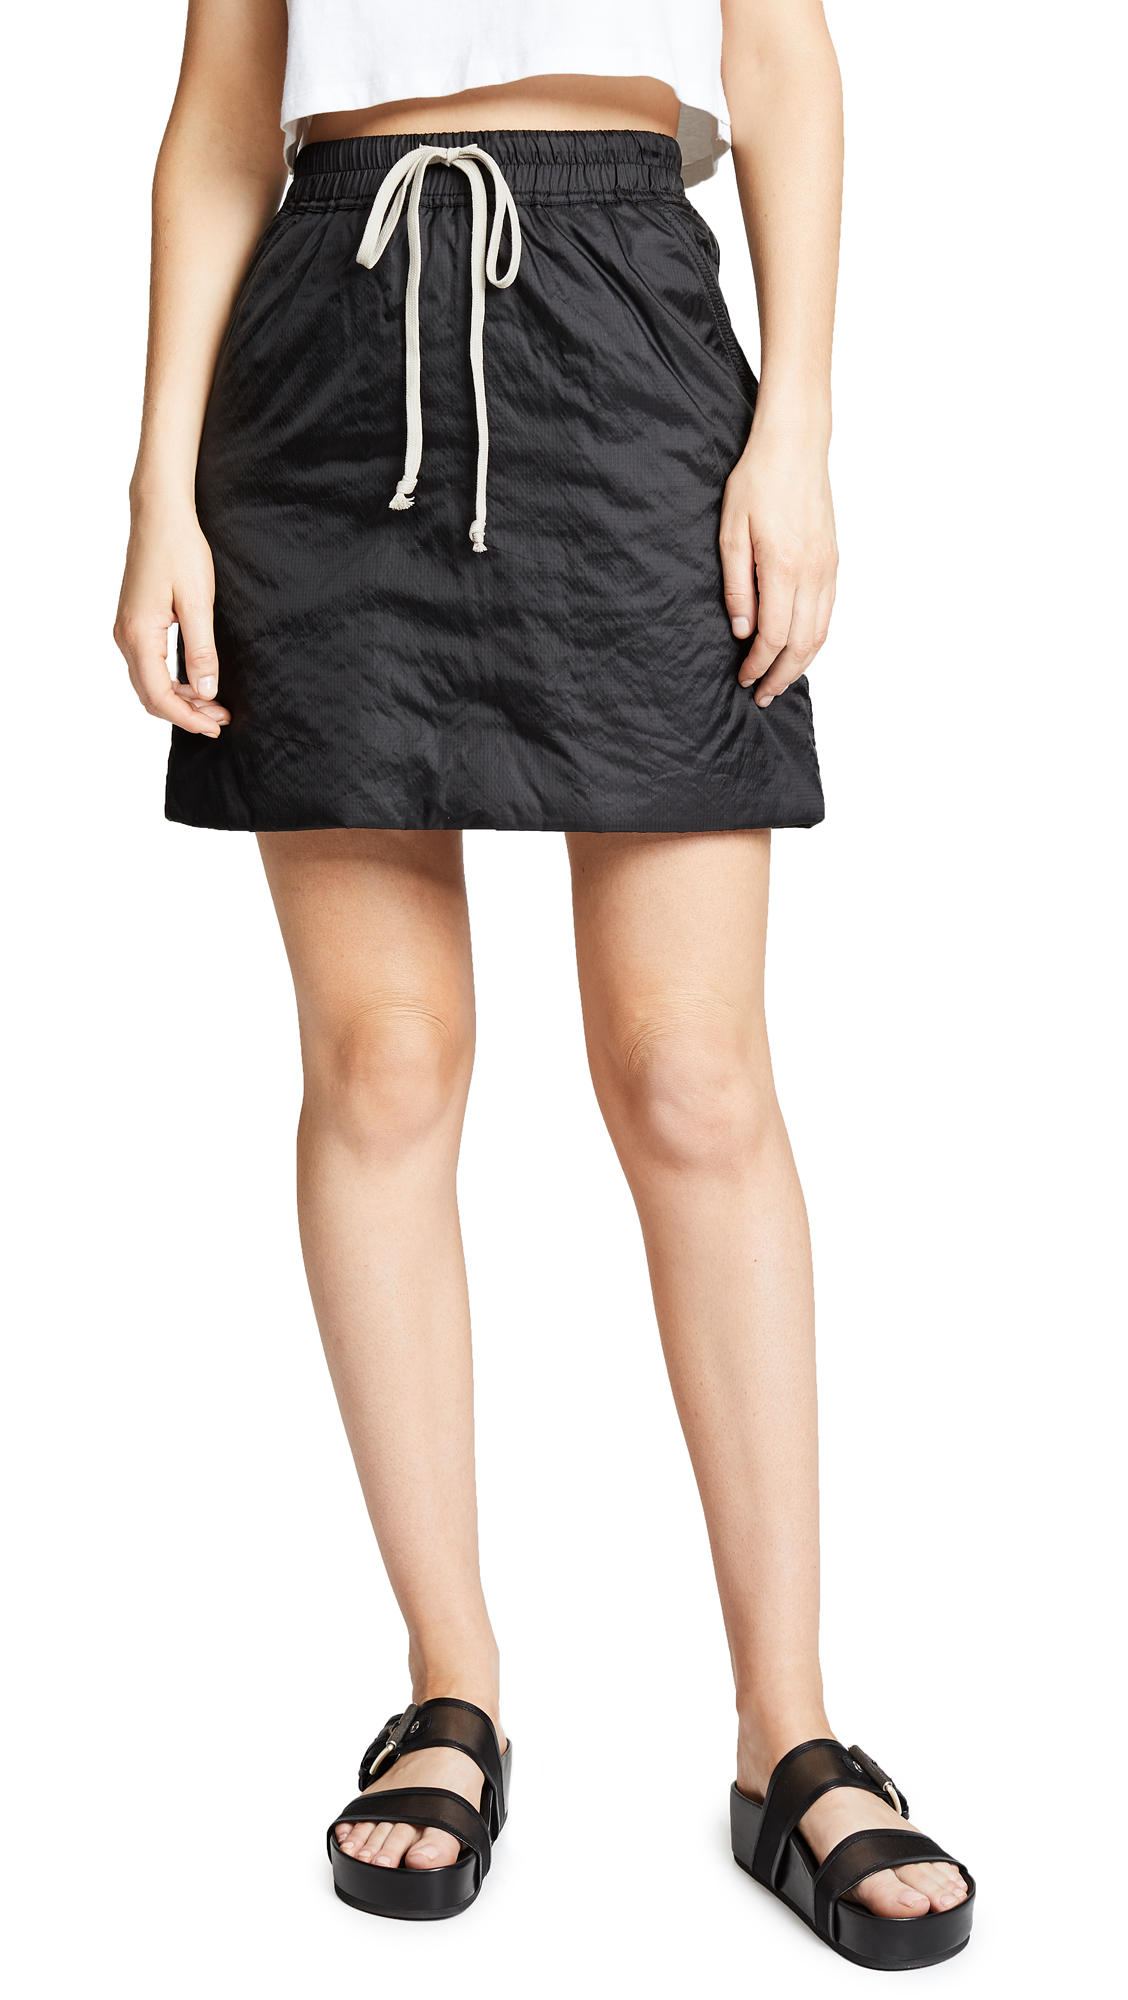 Rick Owens DRKSHDW Drawstring Skirt In Black